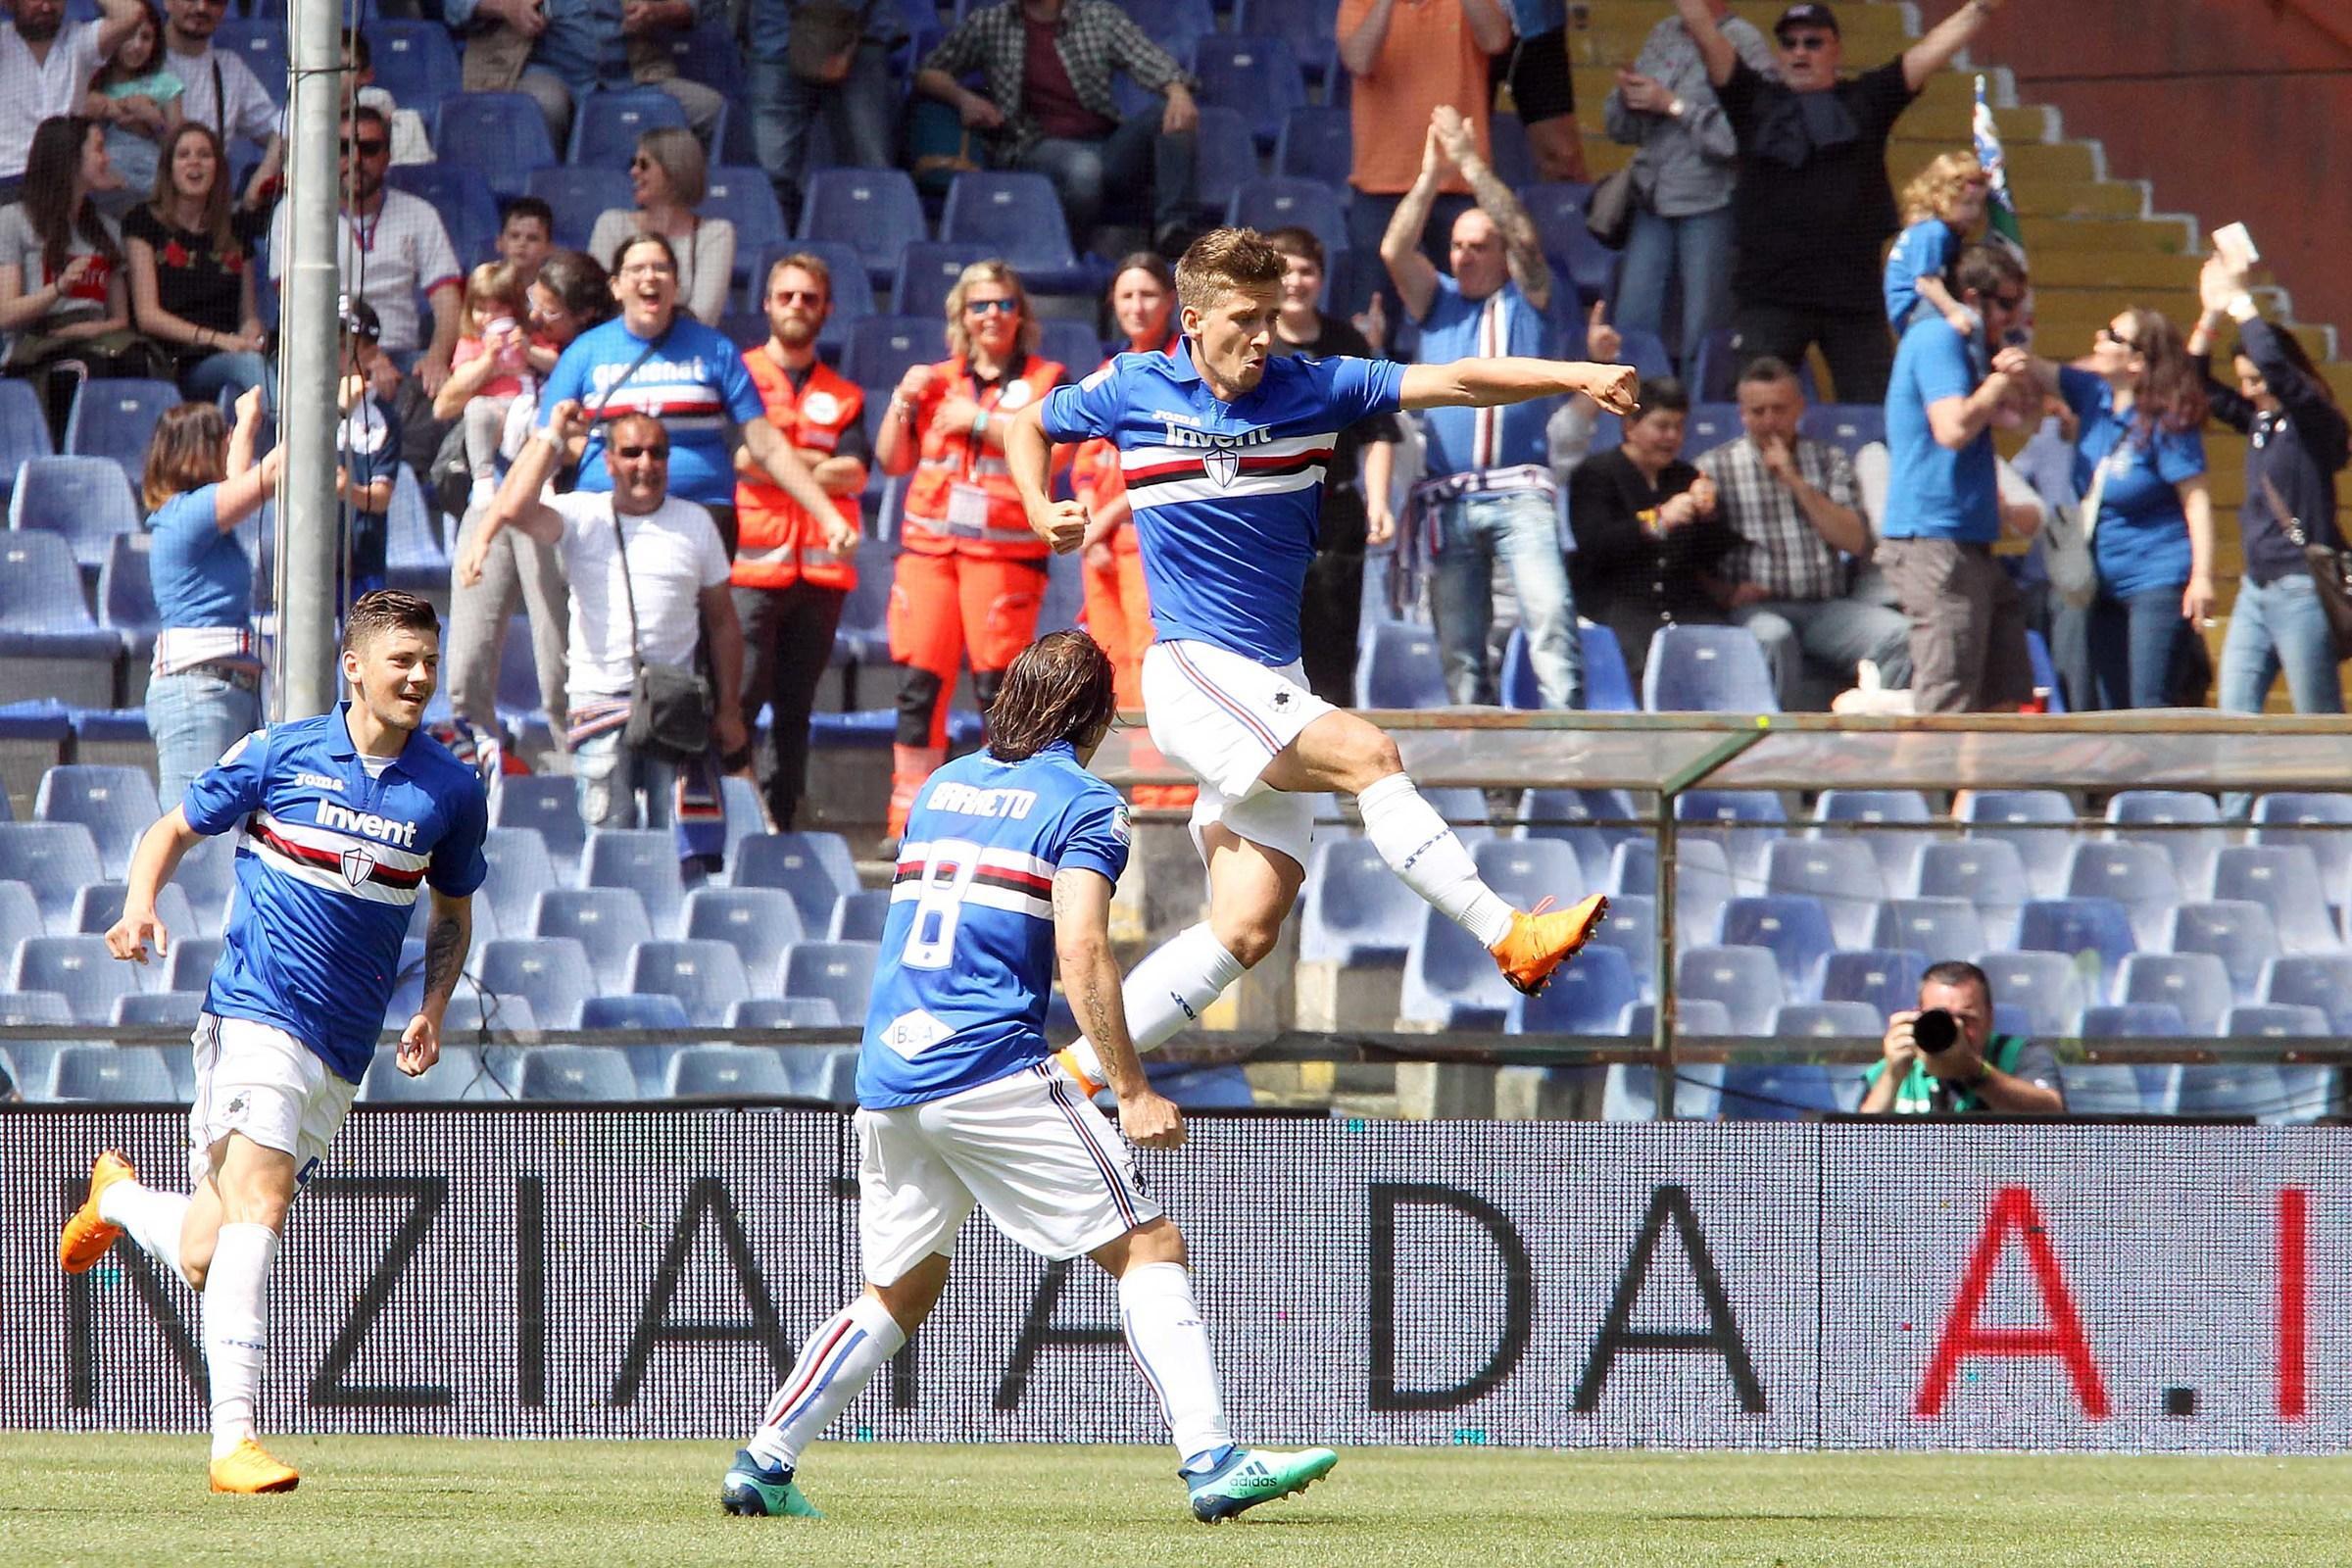 Serie A, Sampdoria-Cagliari 4-1: decidono Praet, Quagliarella, Kownacki e Ramirez